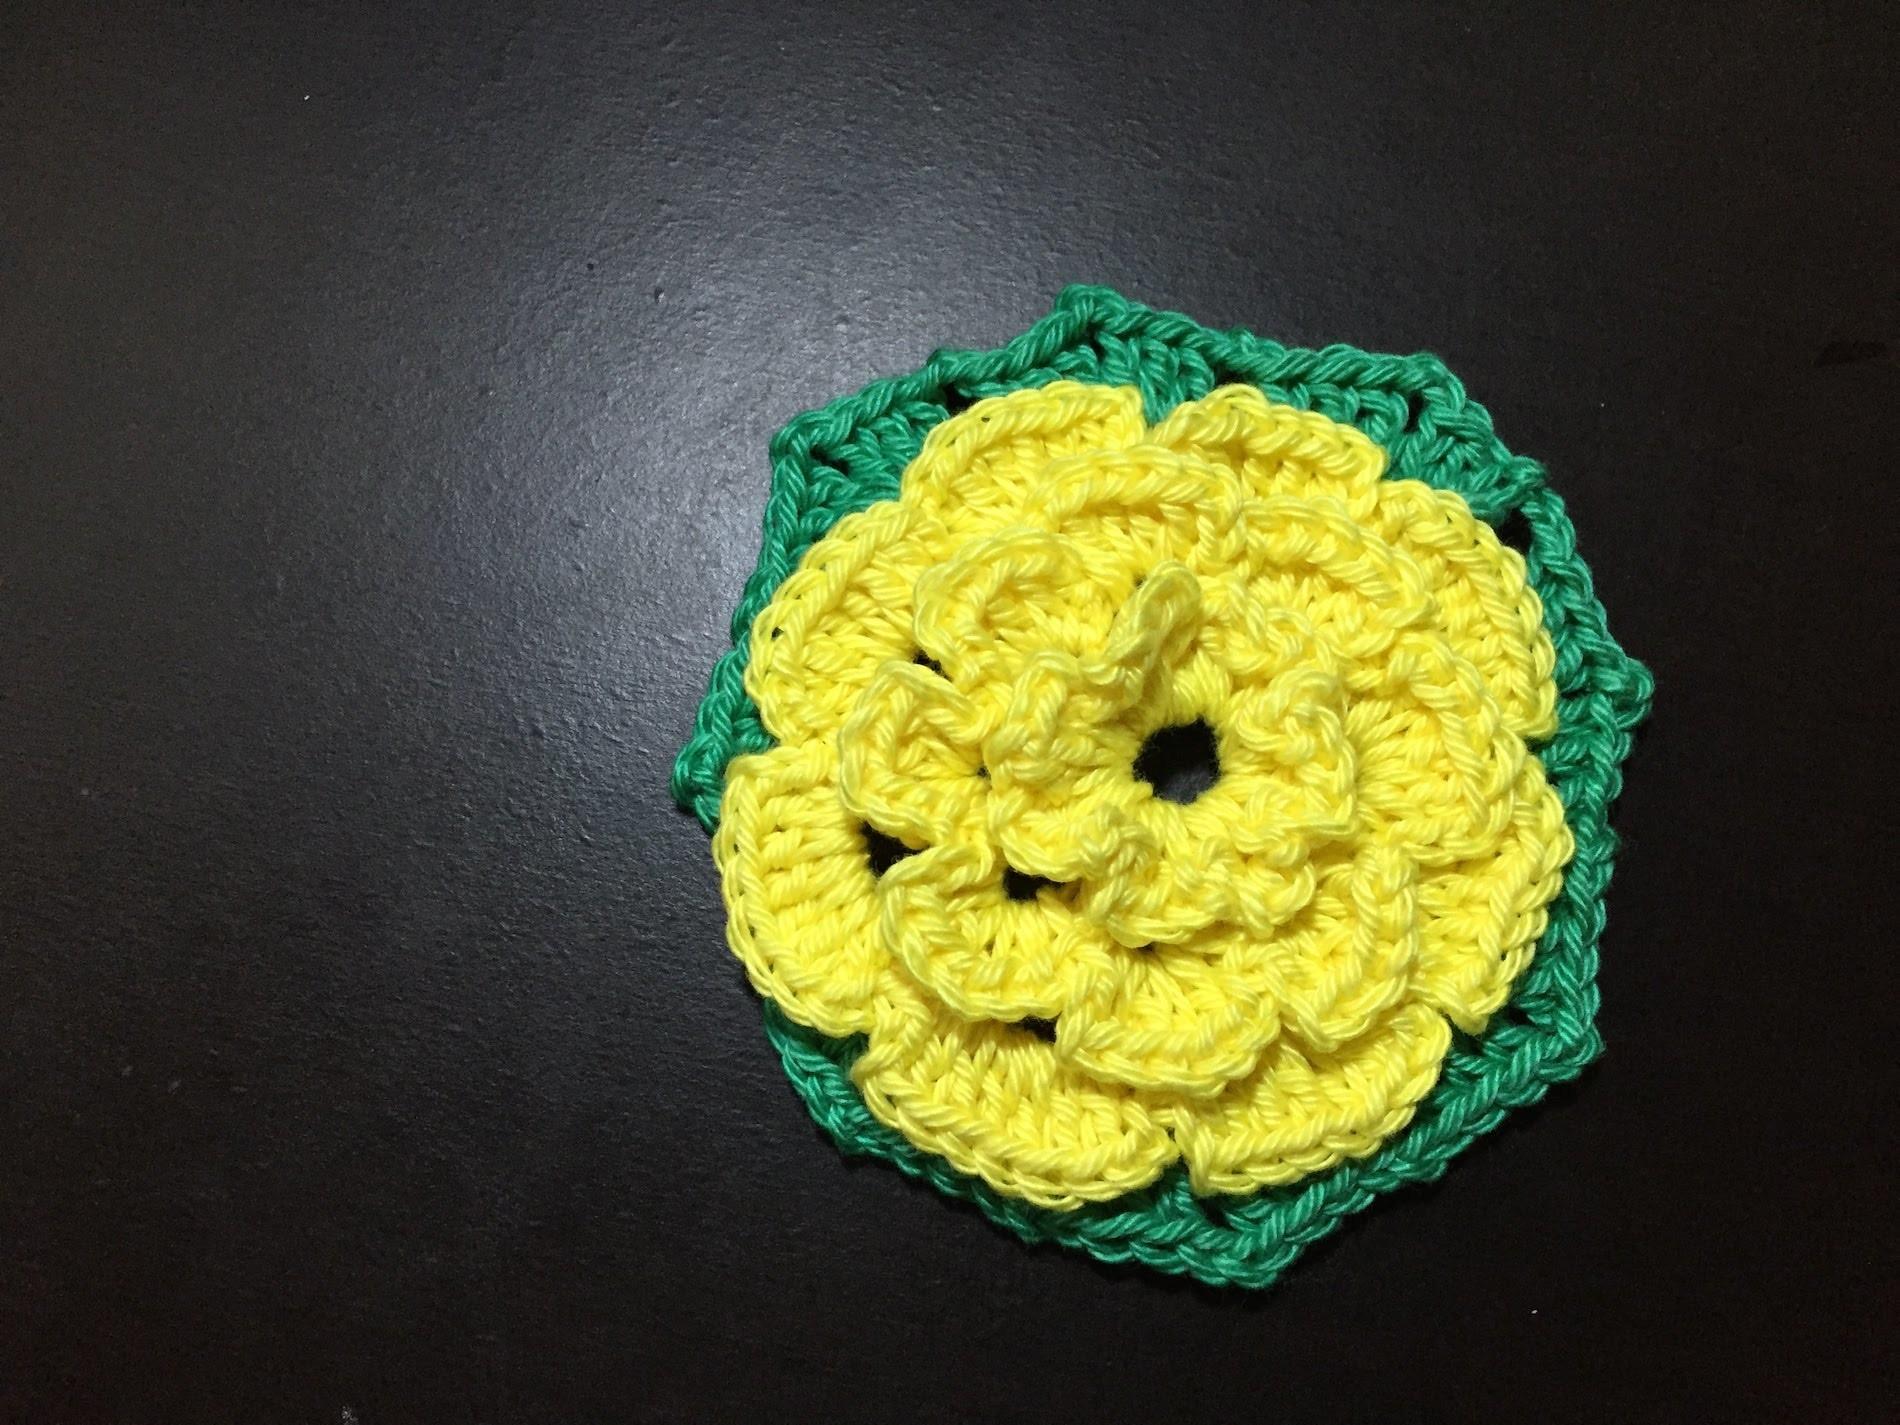 Tuto crochet jolie Fleur Hexagone